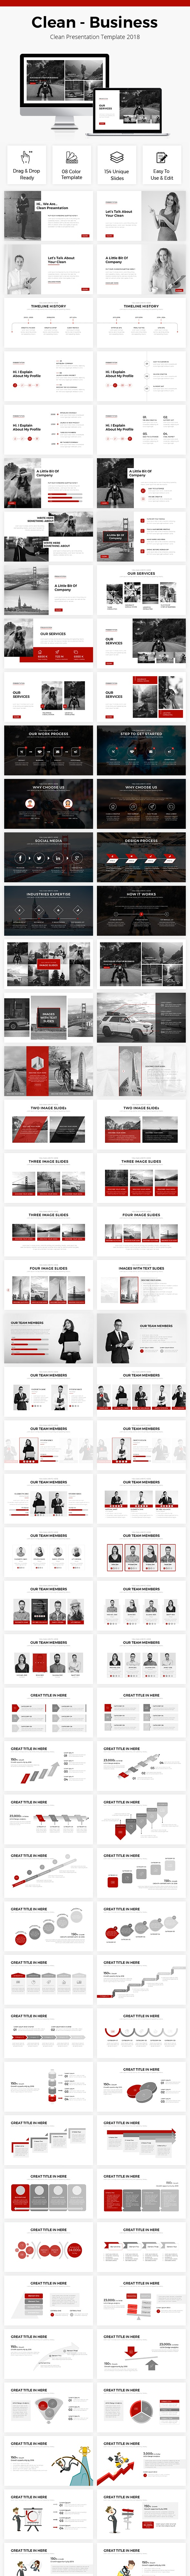 Business Presentation Keynote Template 2018 - Business Keynote Templates